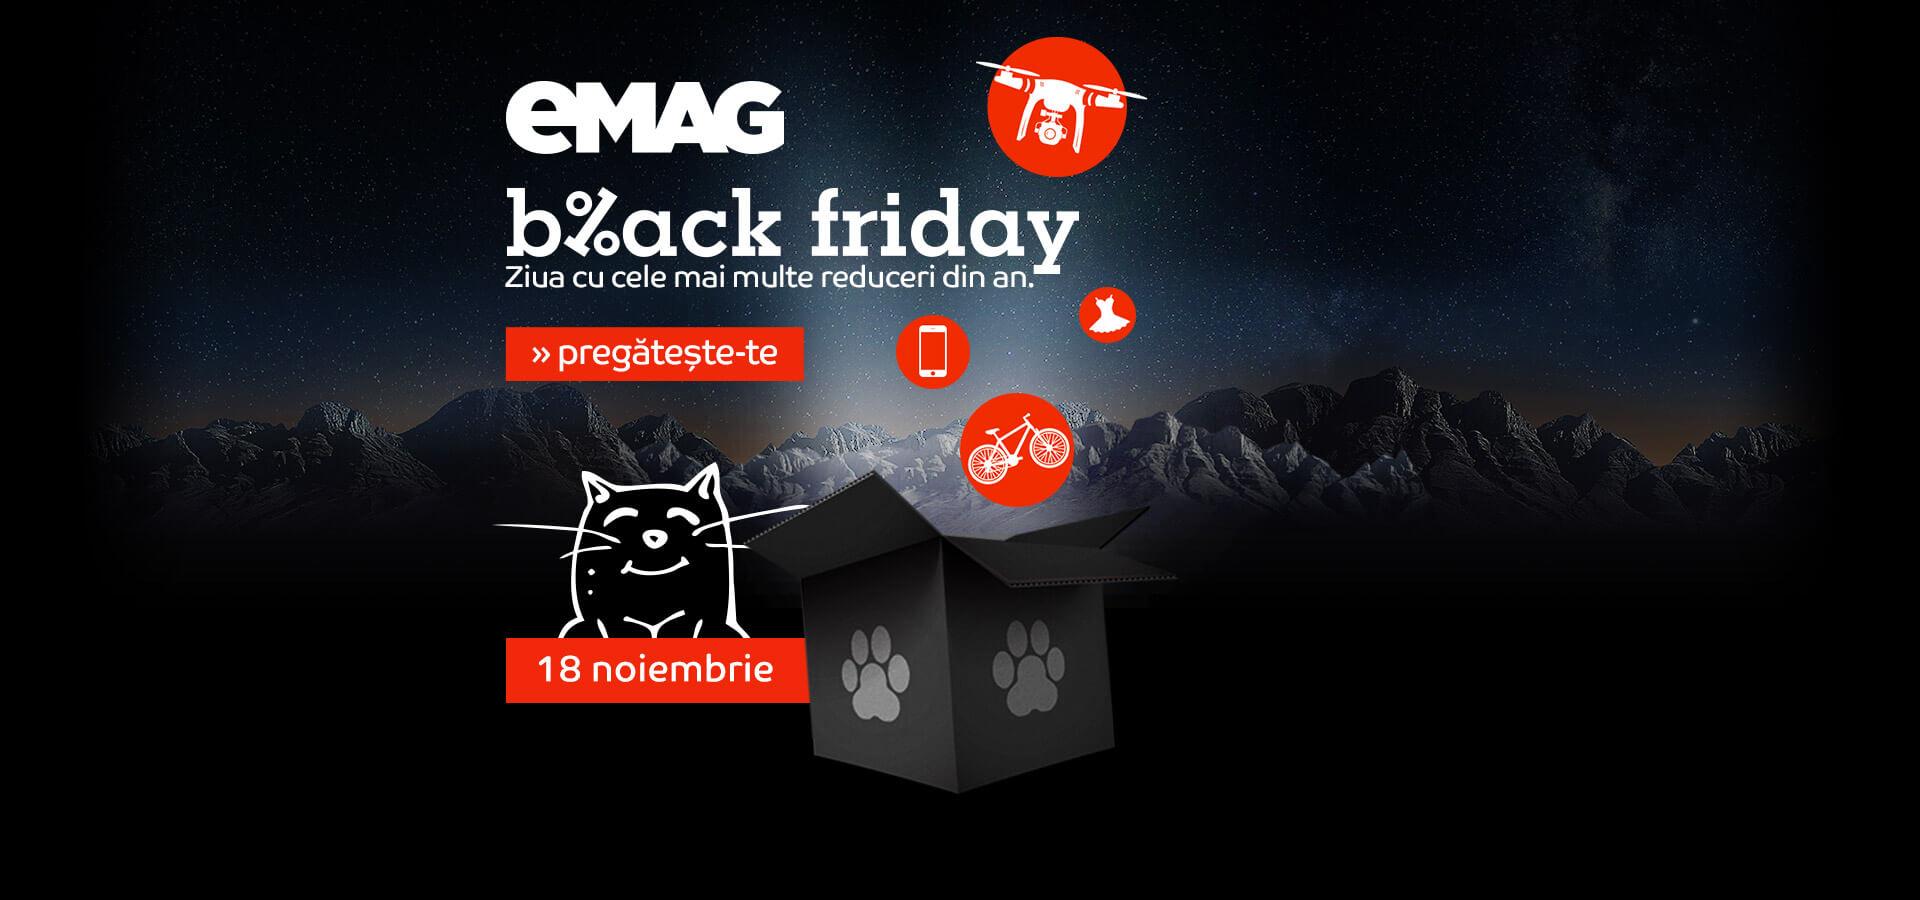 Reduceri Black Friday: eMAG are reduceri black Friday la mii de produse in oferte attractive. eMAG Black Friday incepe in 18 Noiembrie la ora 7